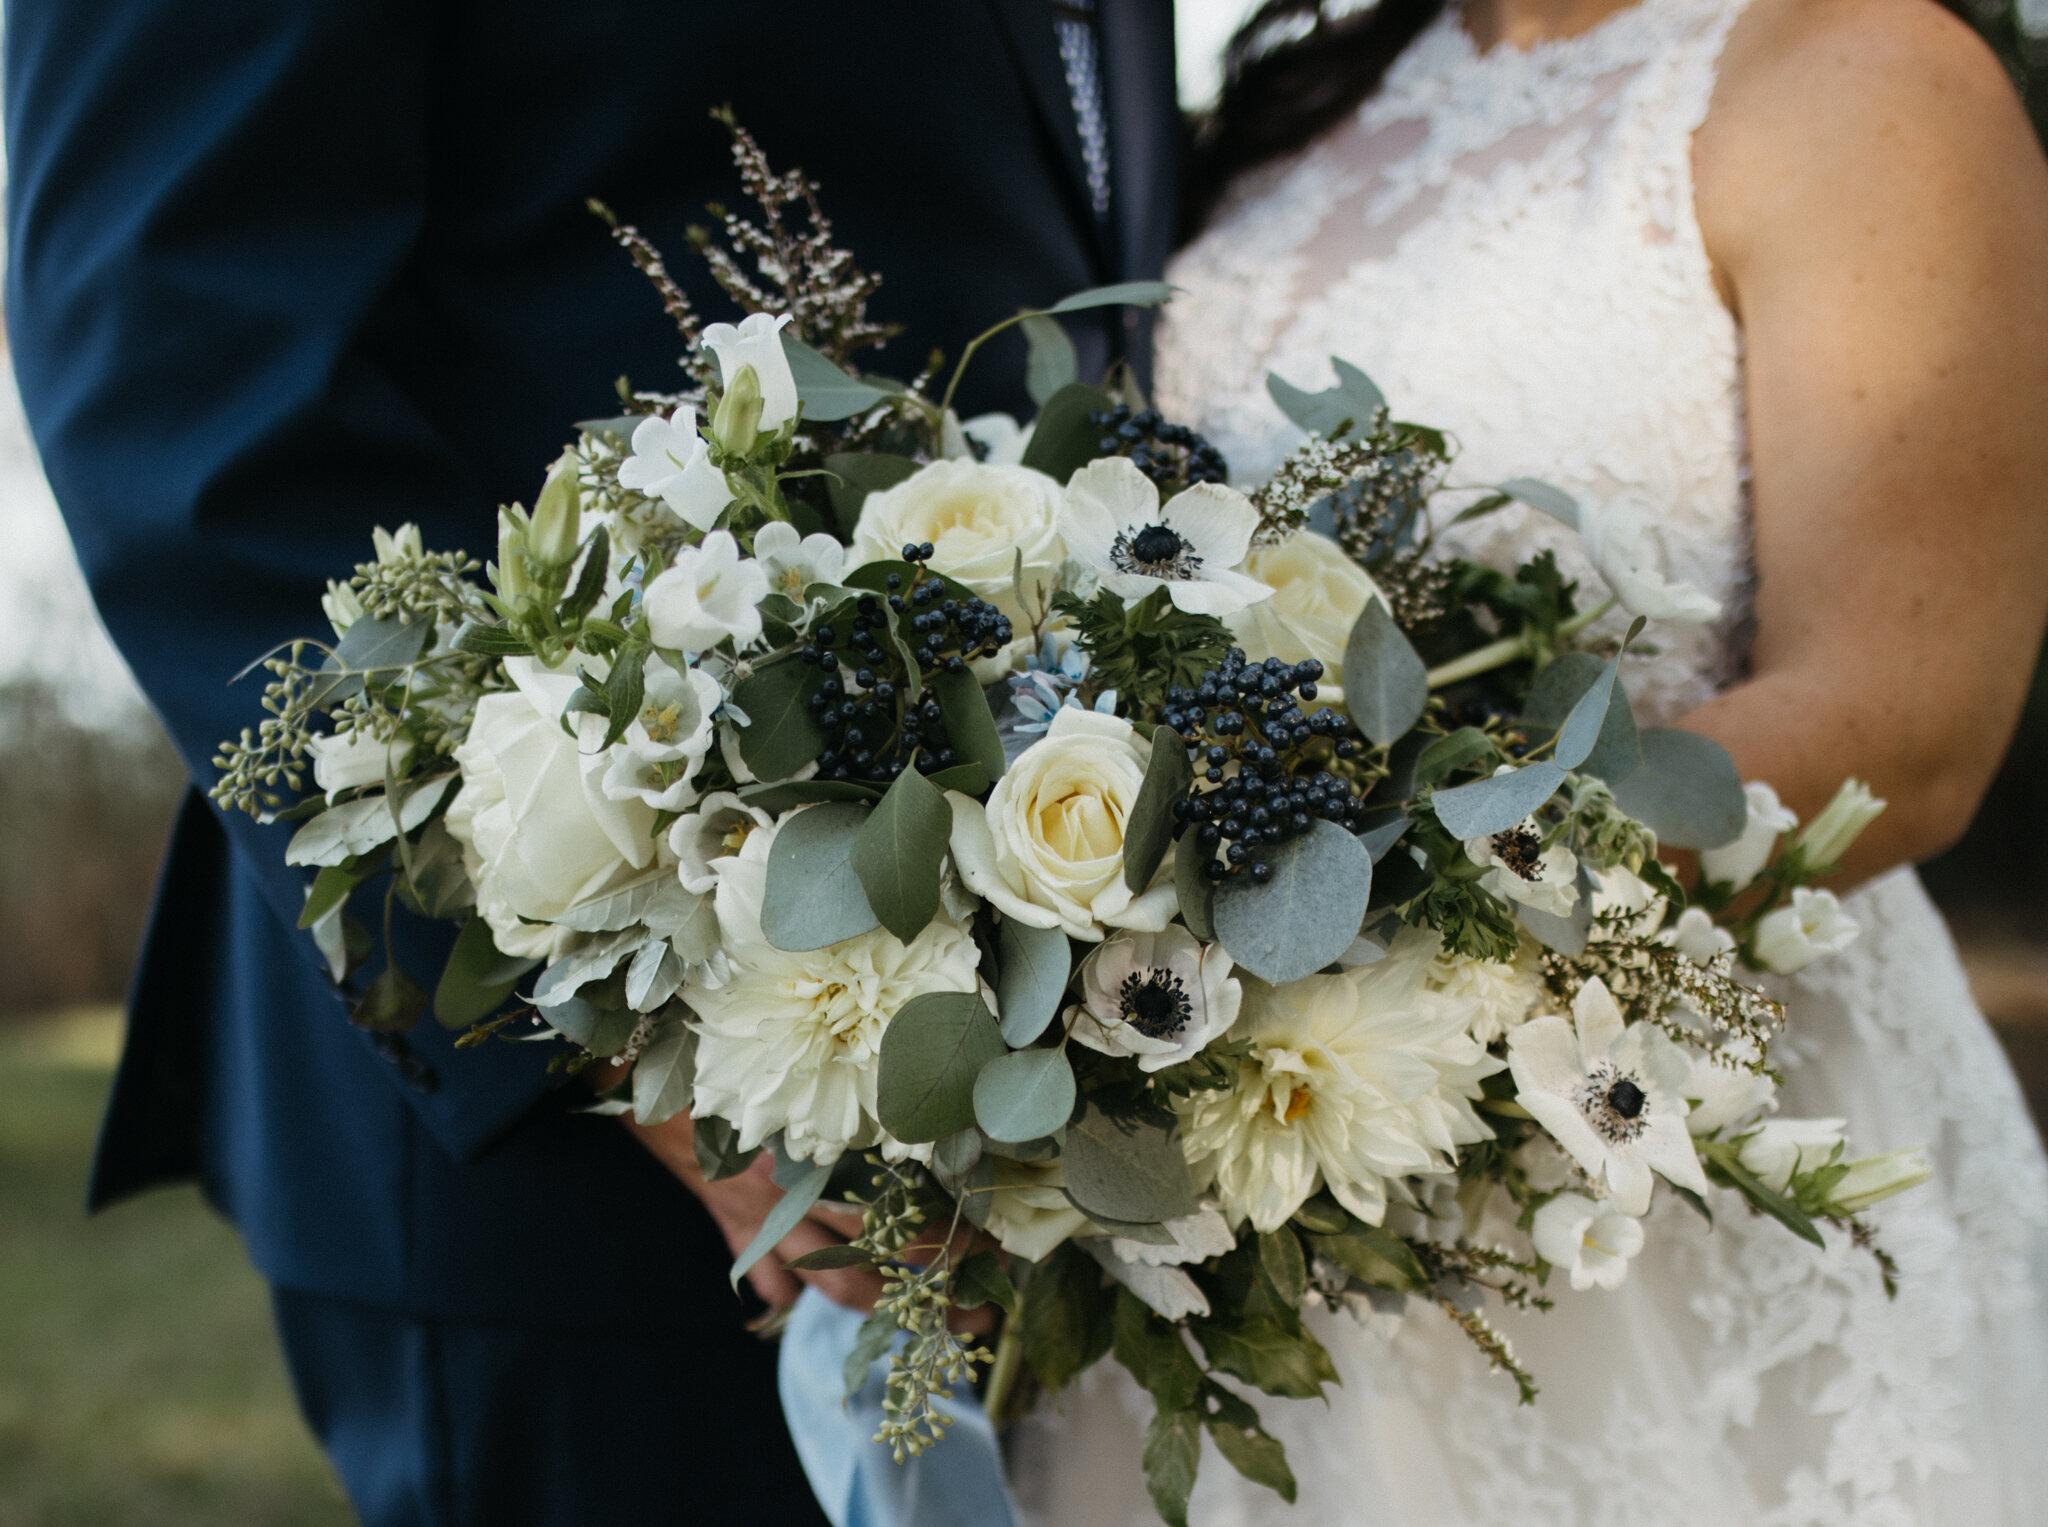 angela_jason_norfolk_wedding-55.jpg